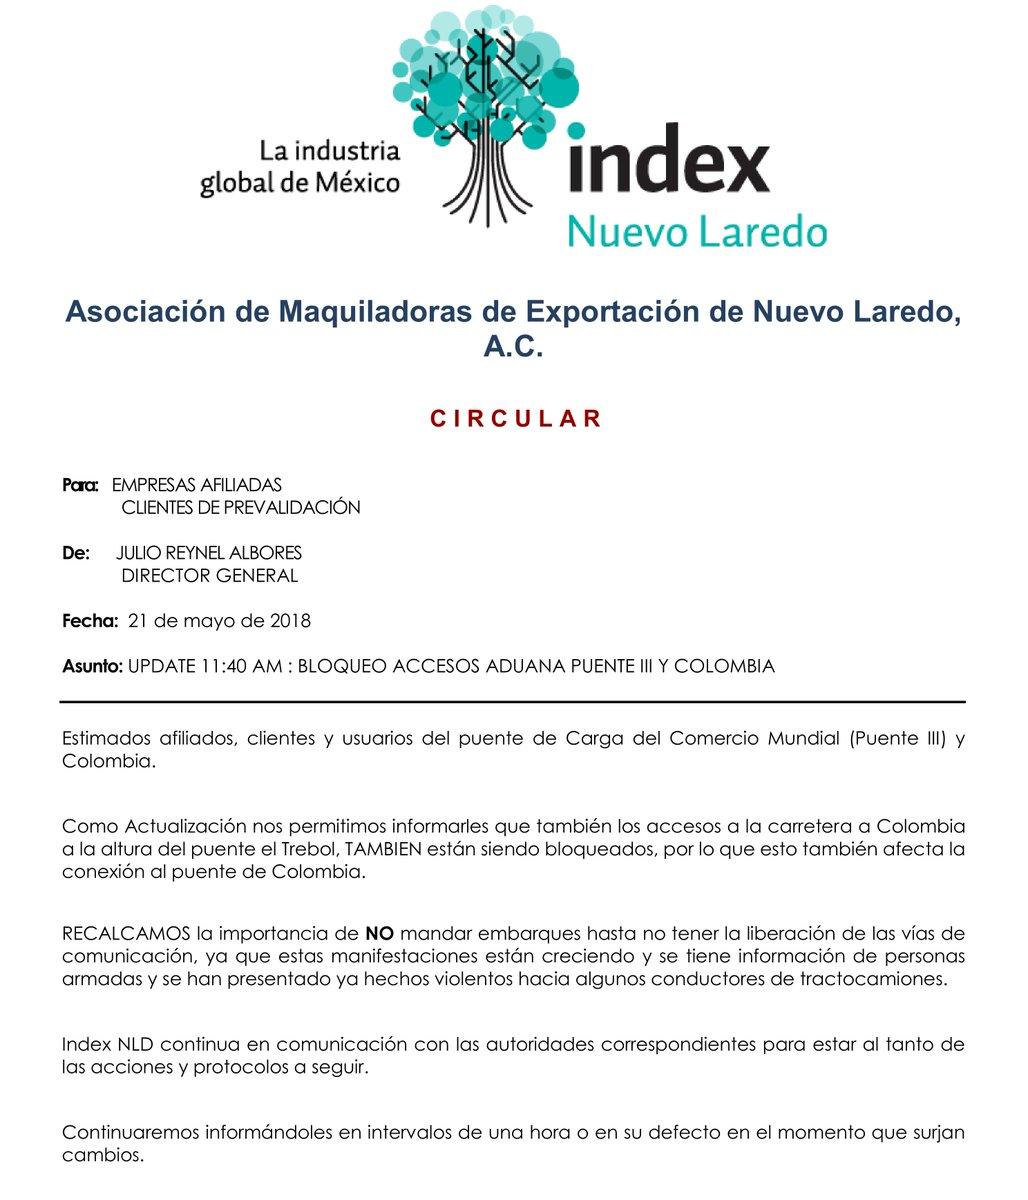 index NLD on Twitter: